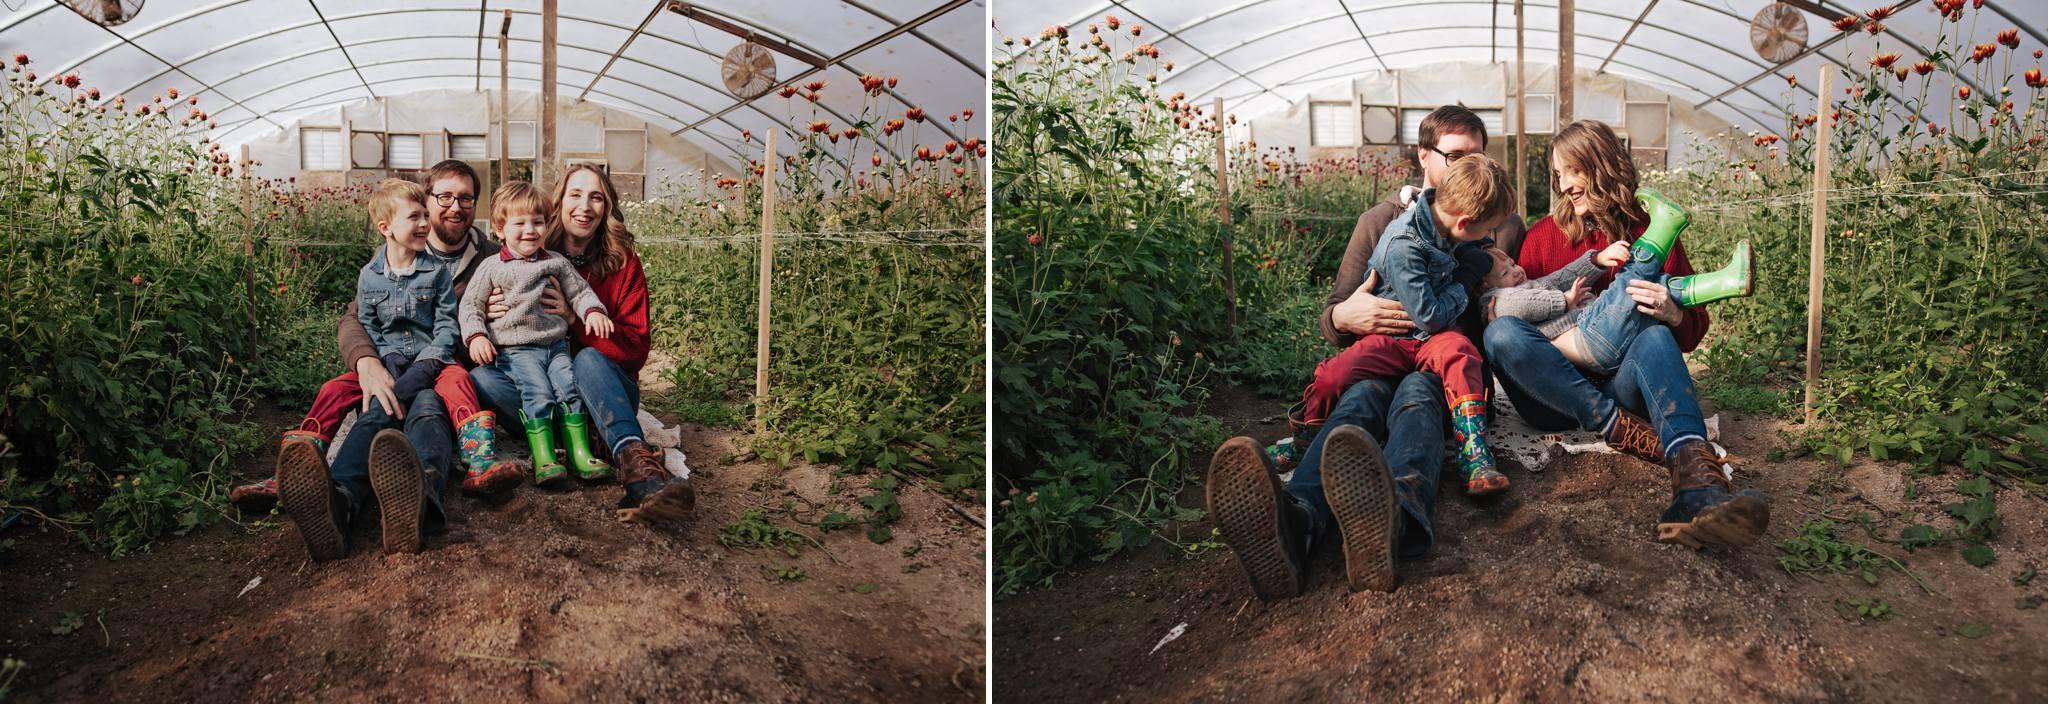 columbus-ohio-family-lifestyle-farm-photography-2.jpg